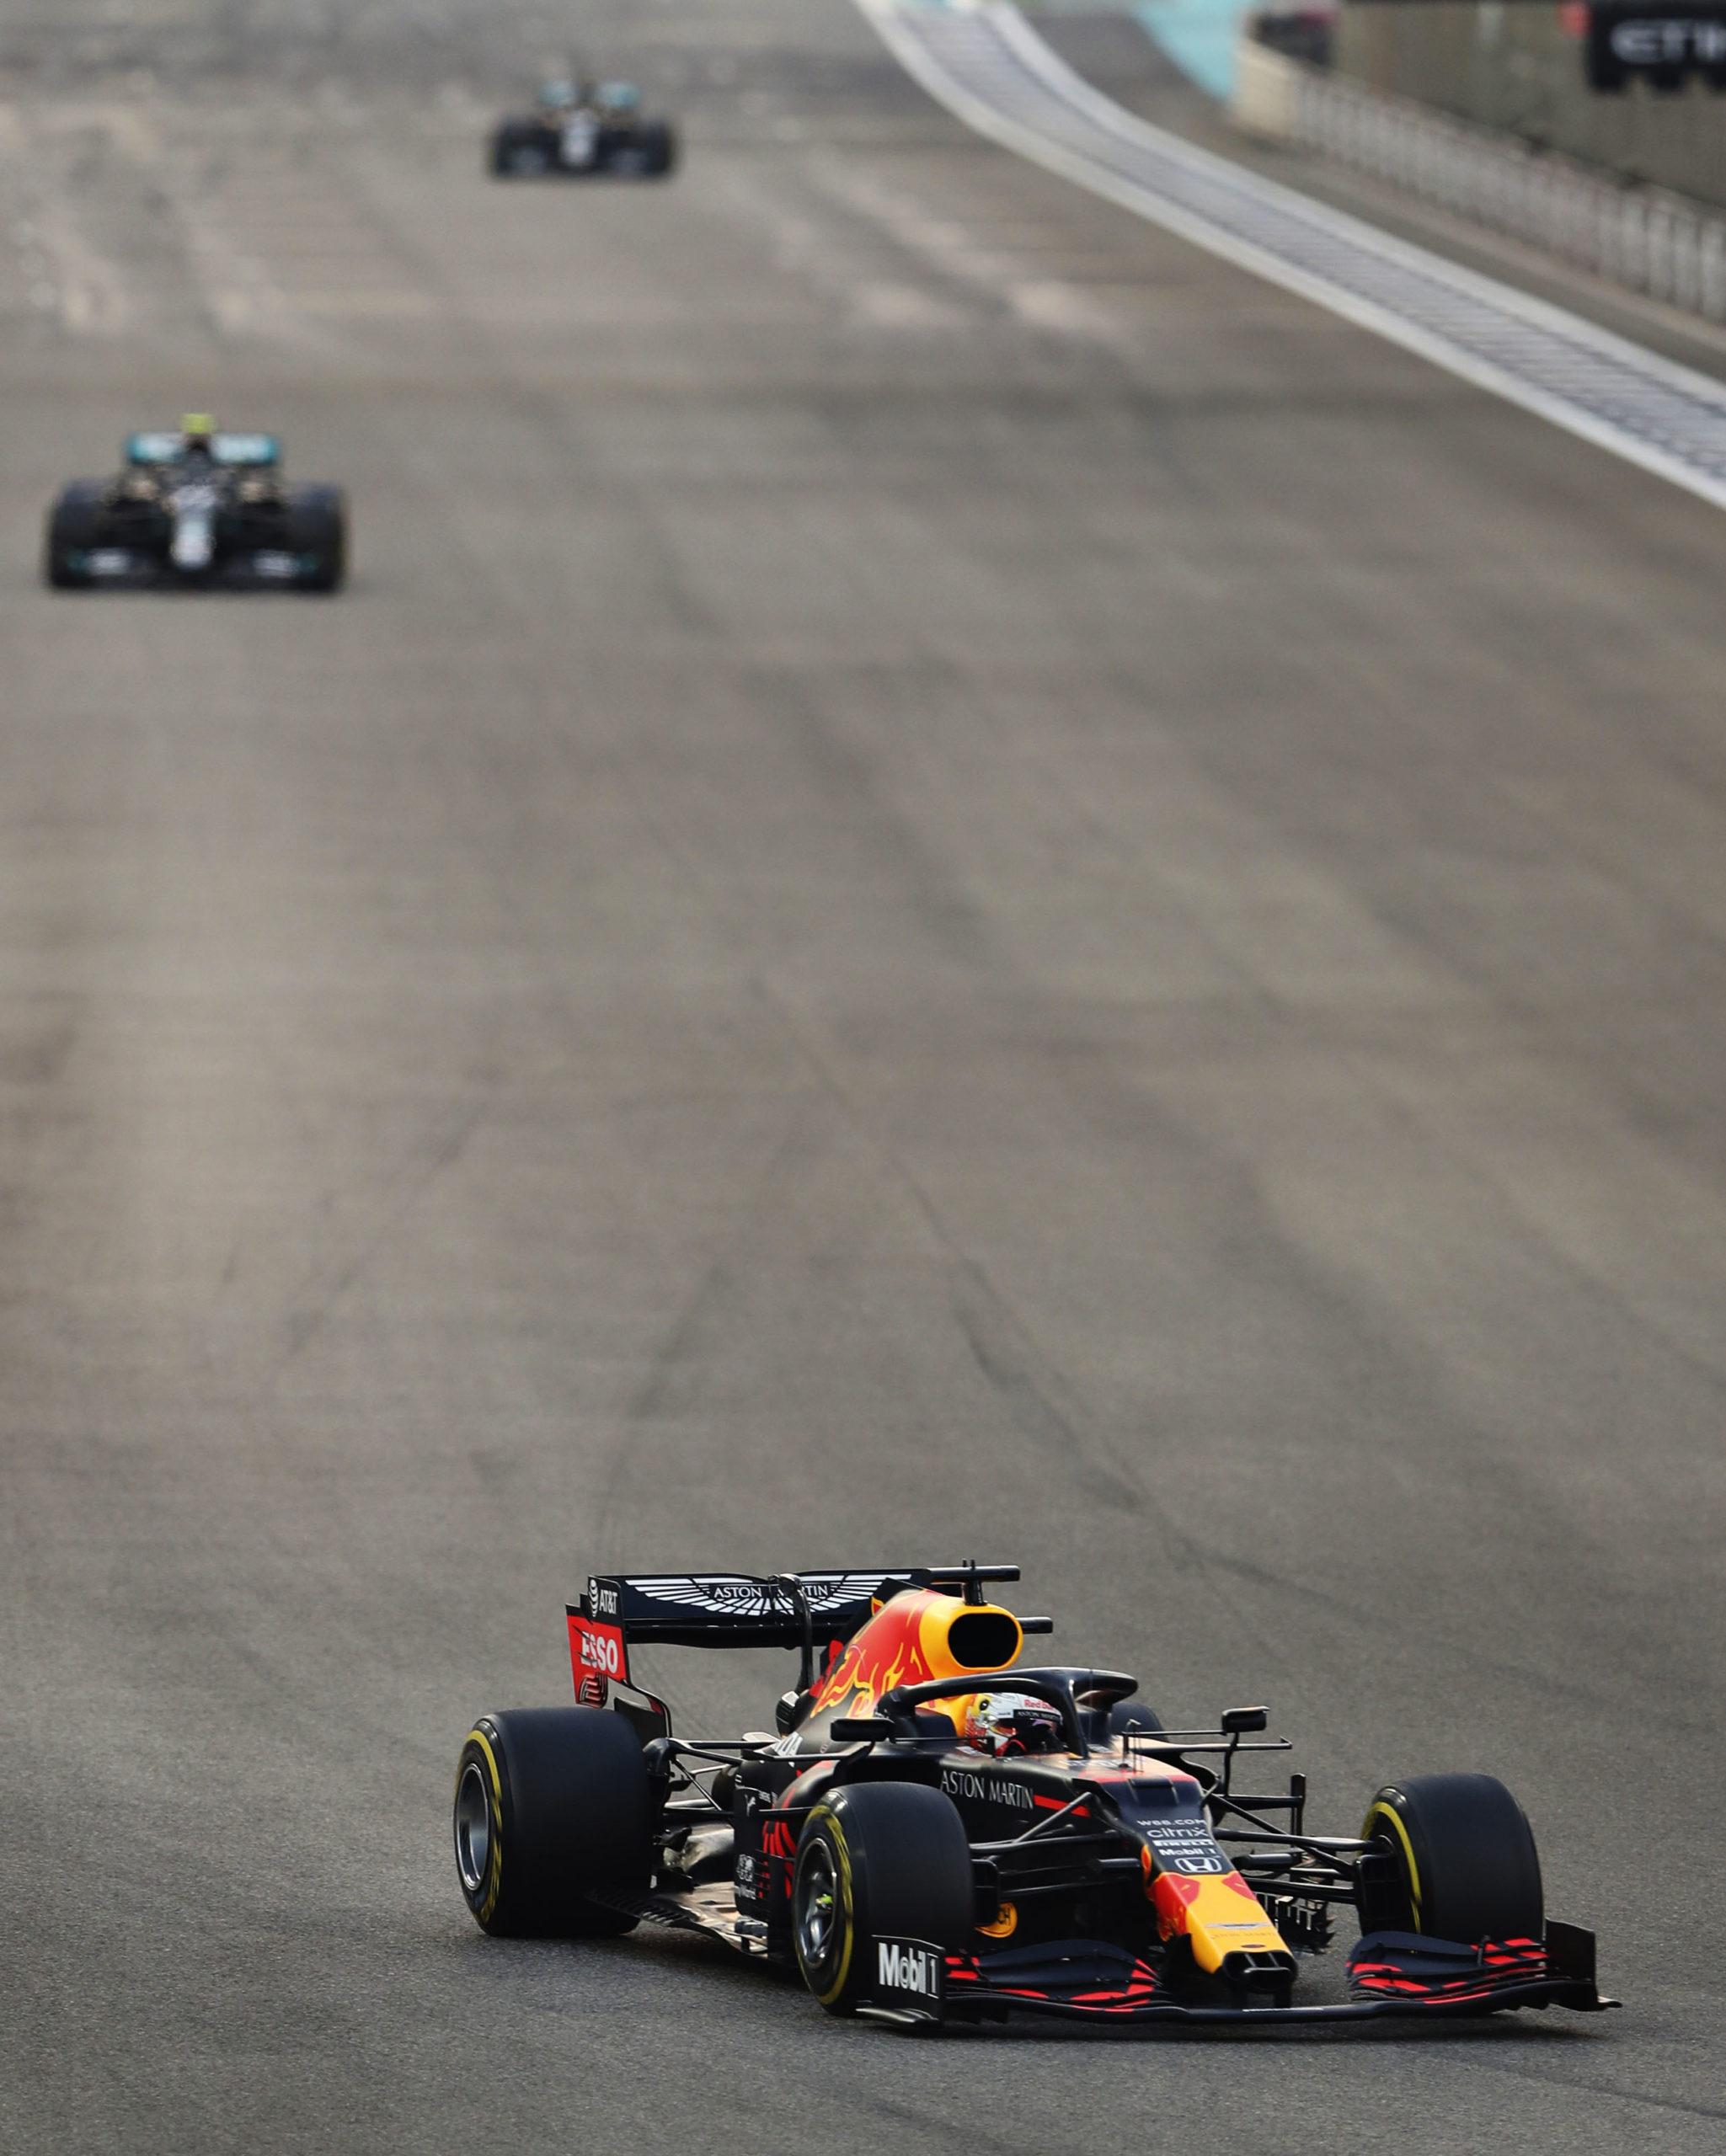 Max-Verstappen-leads-the-2020-Abu-Dhabi-Grand-Prix